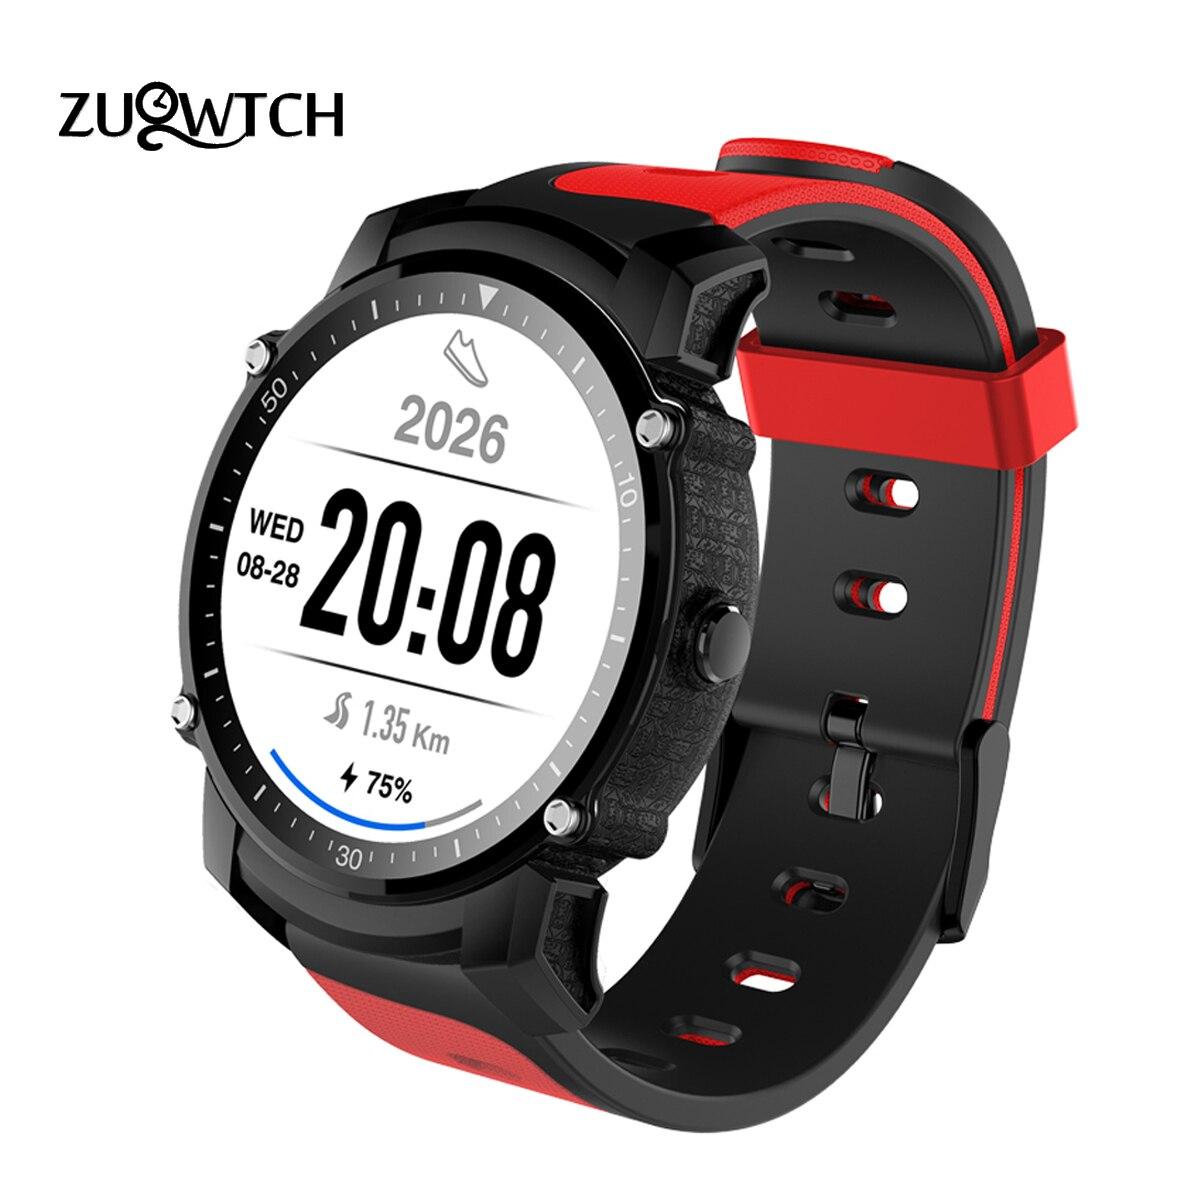 Smart Watch MTK2503 Bluetooth Smartwatch Sport Watch IP68 Waterproof Support GPS Barometer Compass Multi-mode Sport Smartwatch no 1 f2 ip68 bluetooth smartwatch green